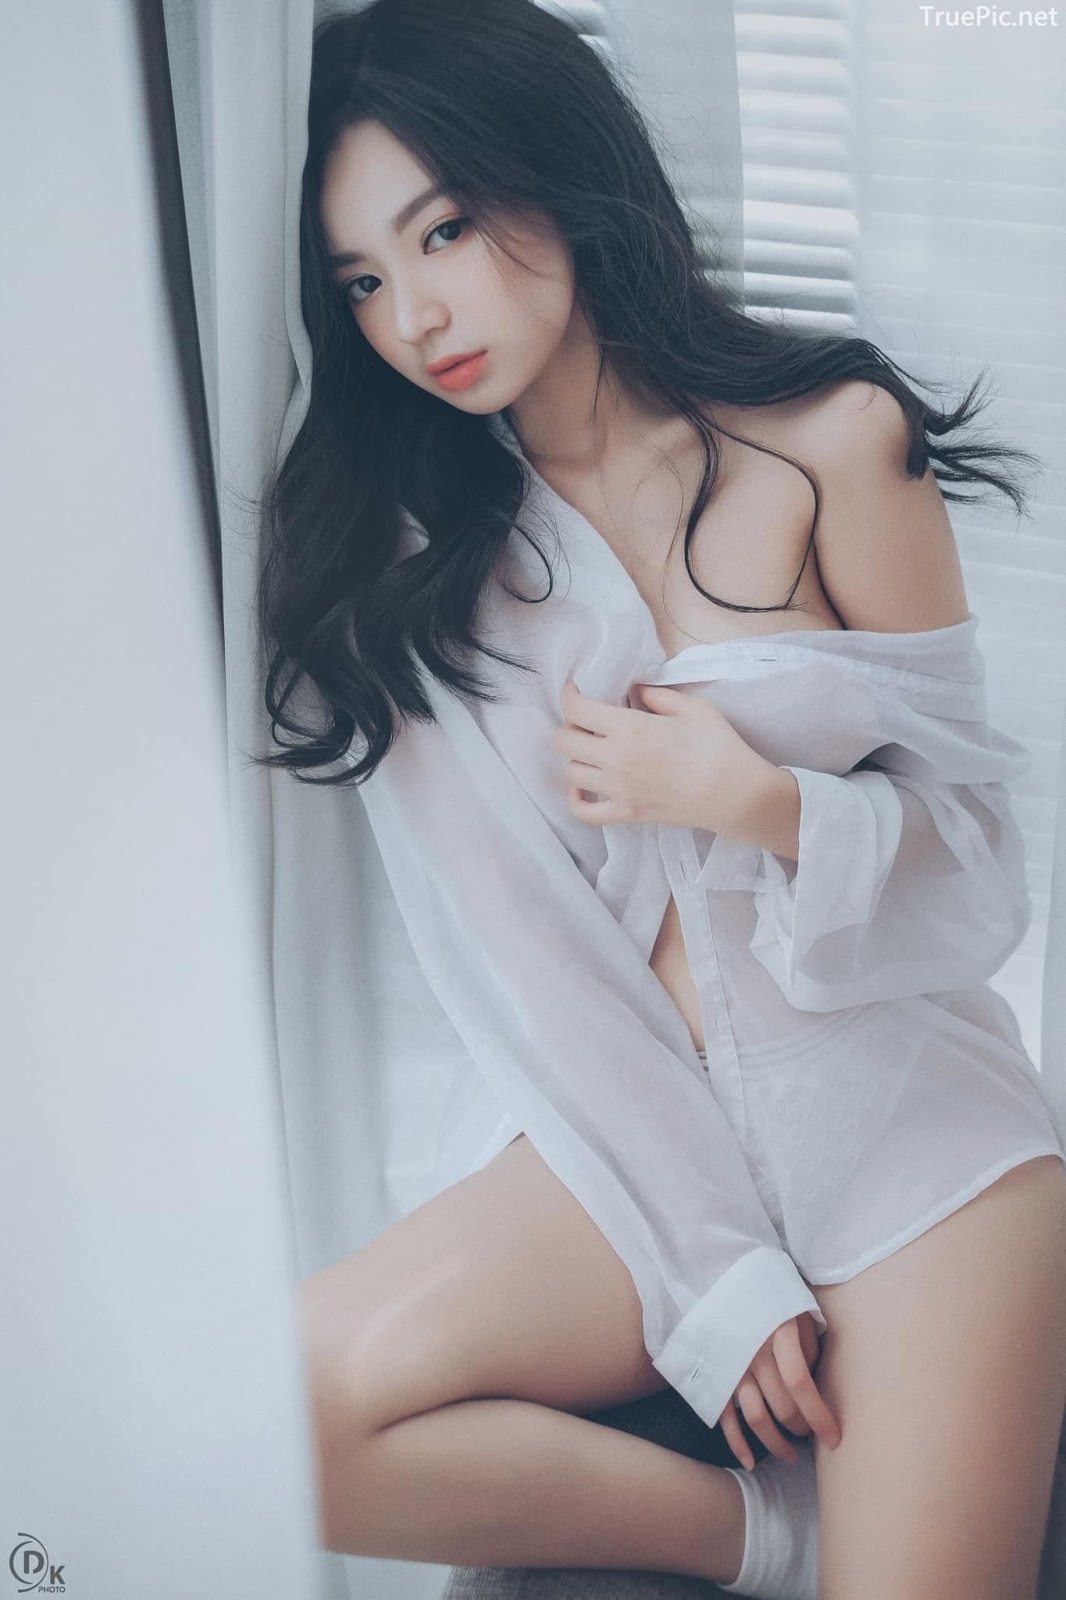 Vietnamese Sexy Model - Vu Ngoc Kim Chi - Beautiful in white - TruePic.net- Picture 19